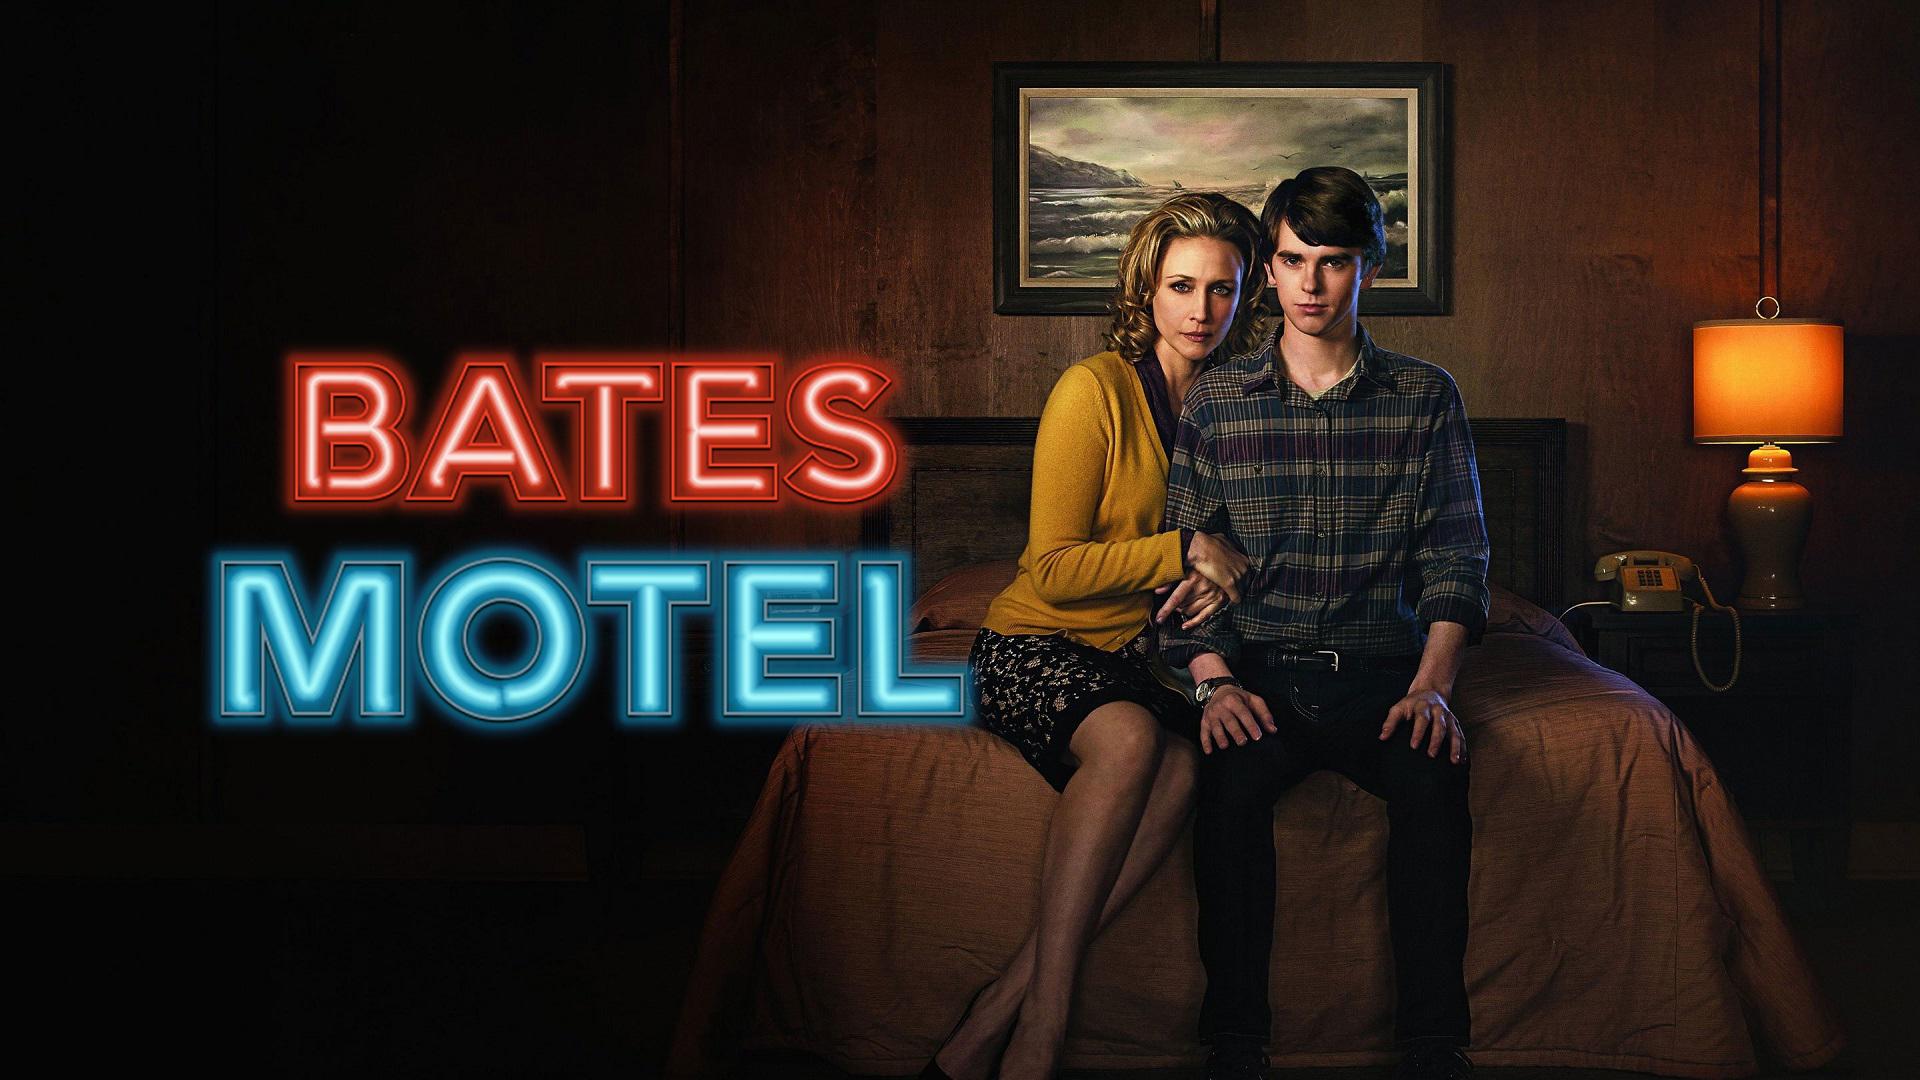 Bates Motel Full HD Wallpaper